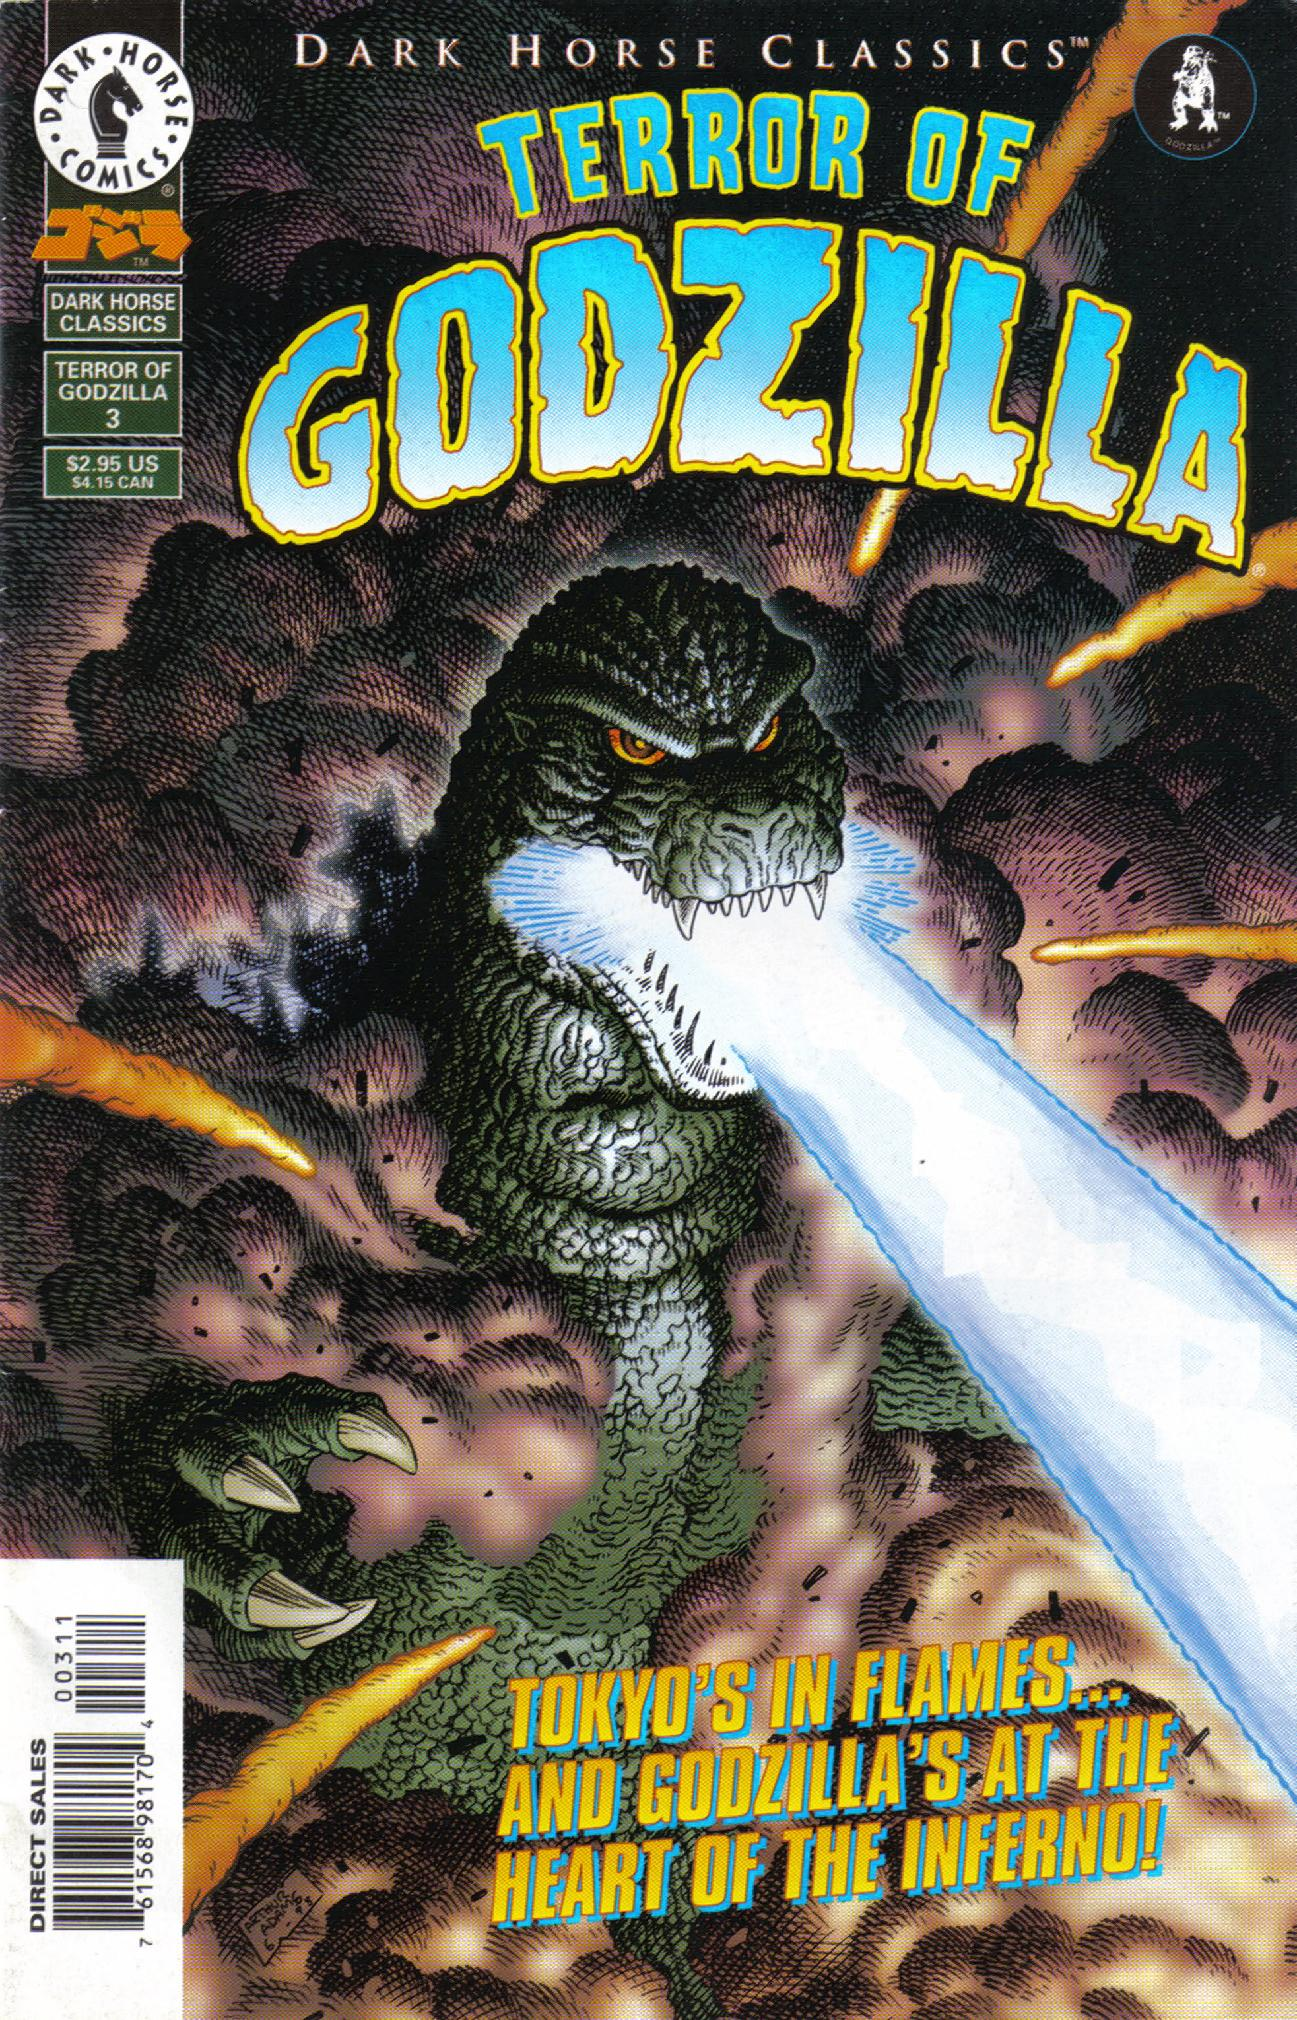 Read online Dark Horse Classics: Terror of Godzilla comic -  Issue #3 - 1